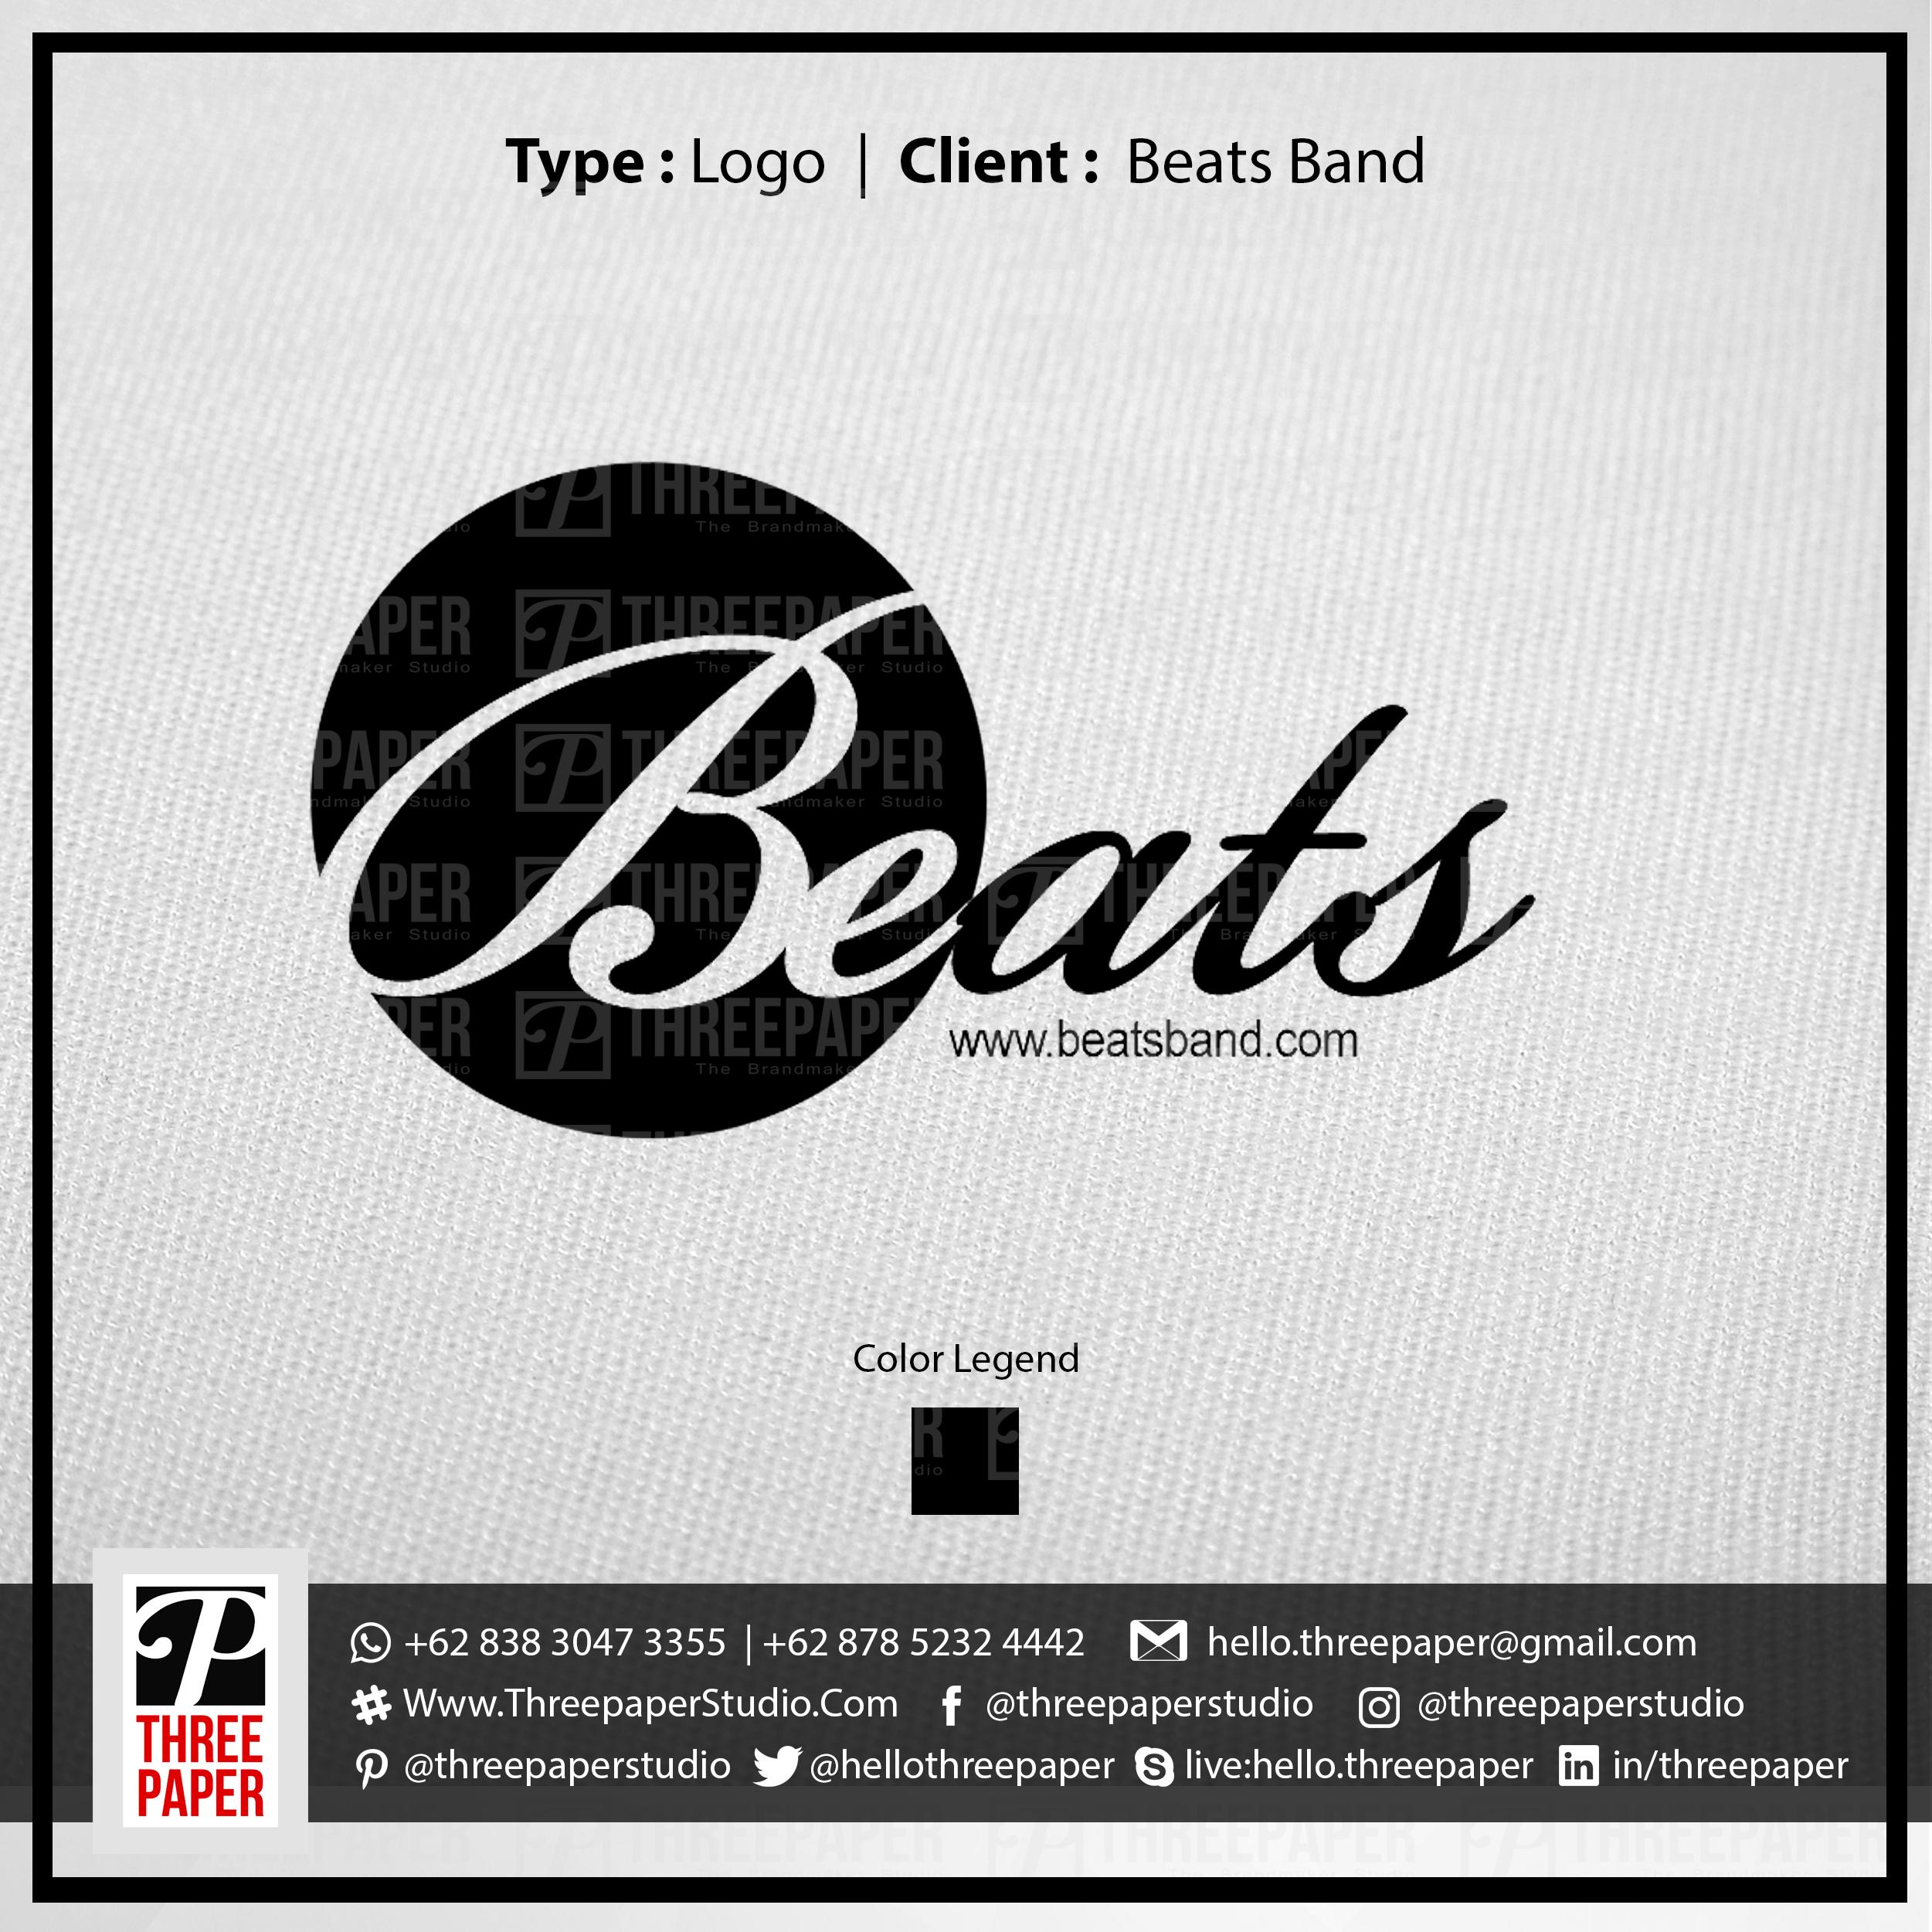 Logo beats band threepaper studio ce328f844e